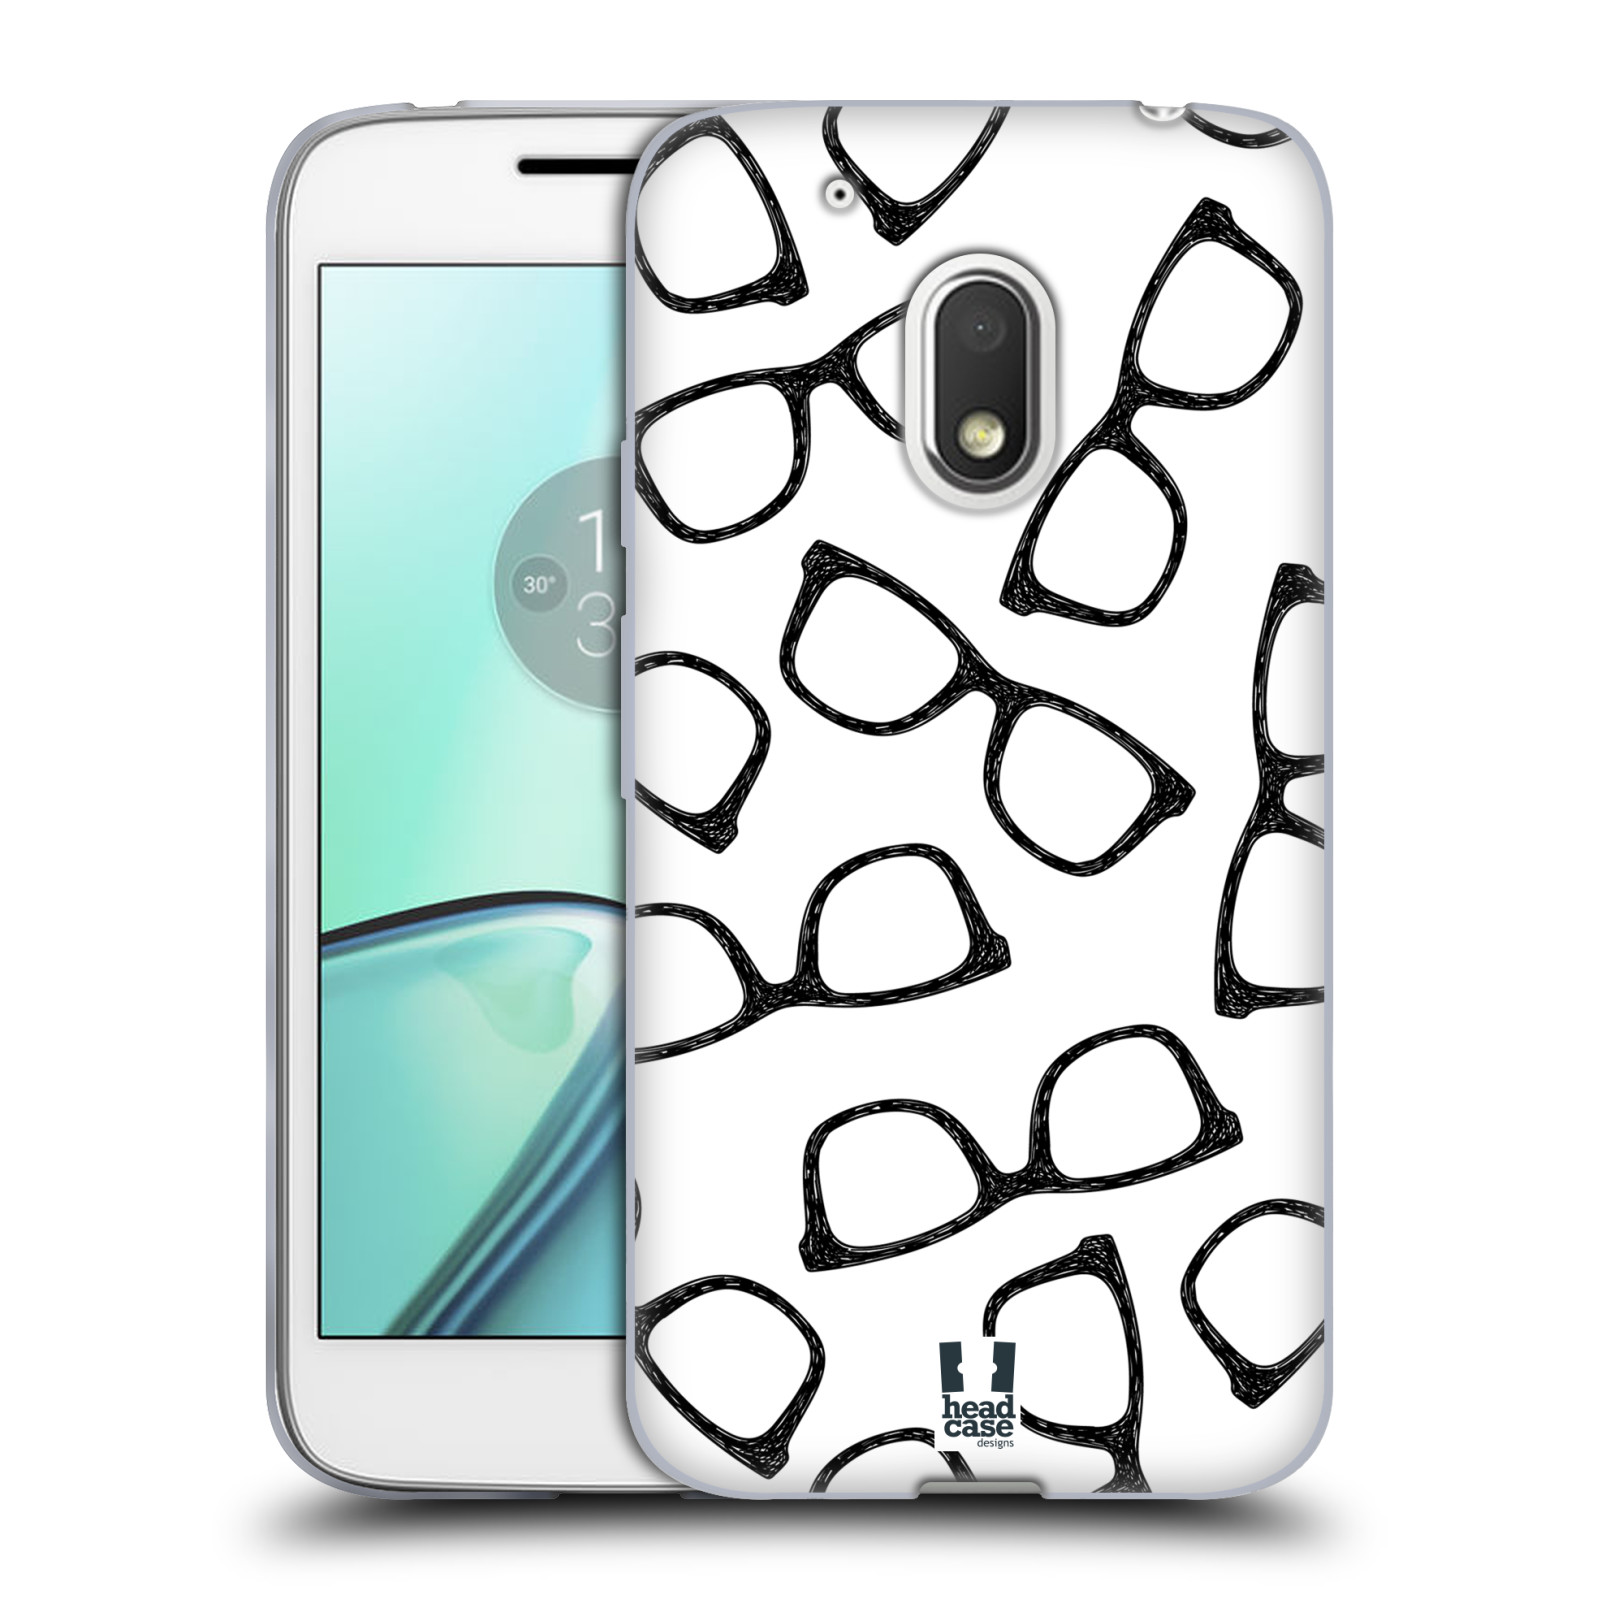 Silikonové pouzdro na mobil Lenovo Moto G4 Play - Head Case - HIPSTER BRÝLE (Silikonový kryt či obal na mobilní telefon (Motorola) Moto G4 Play)